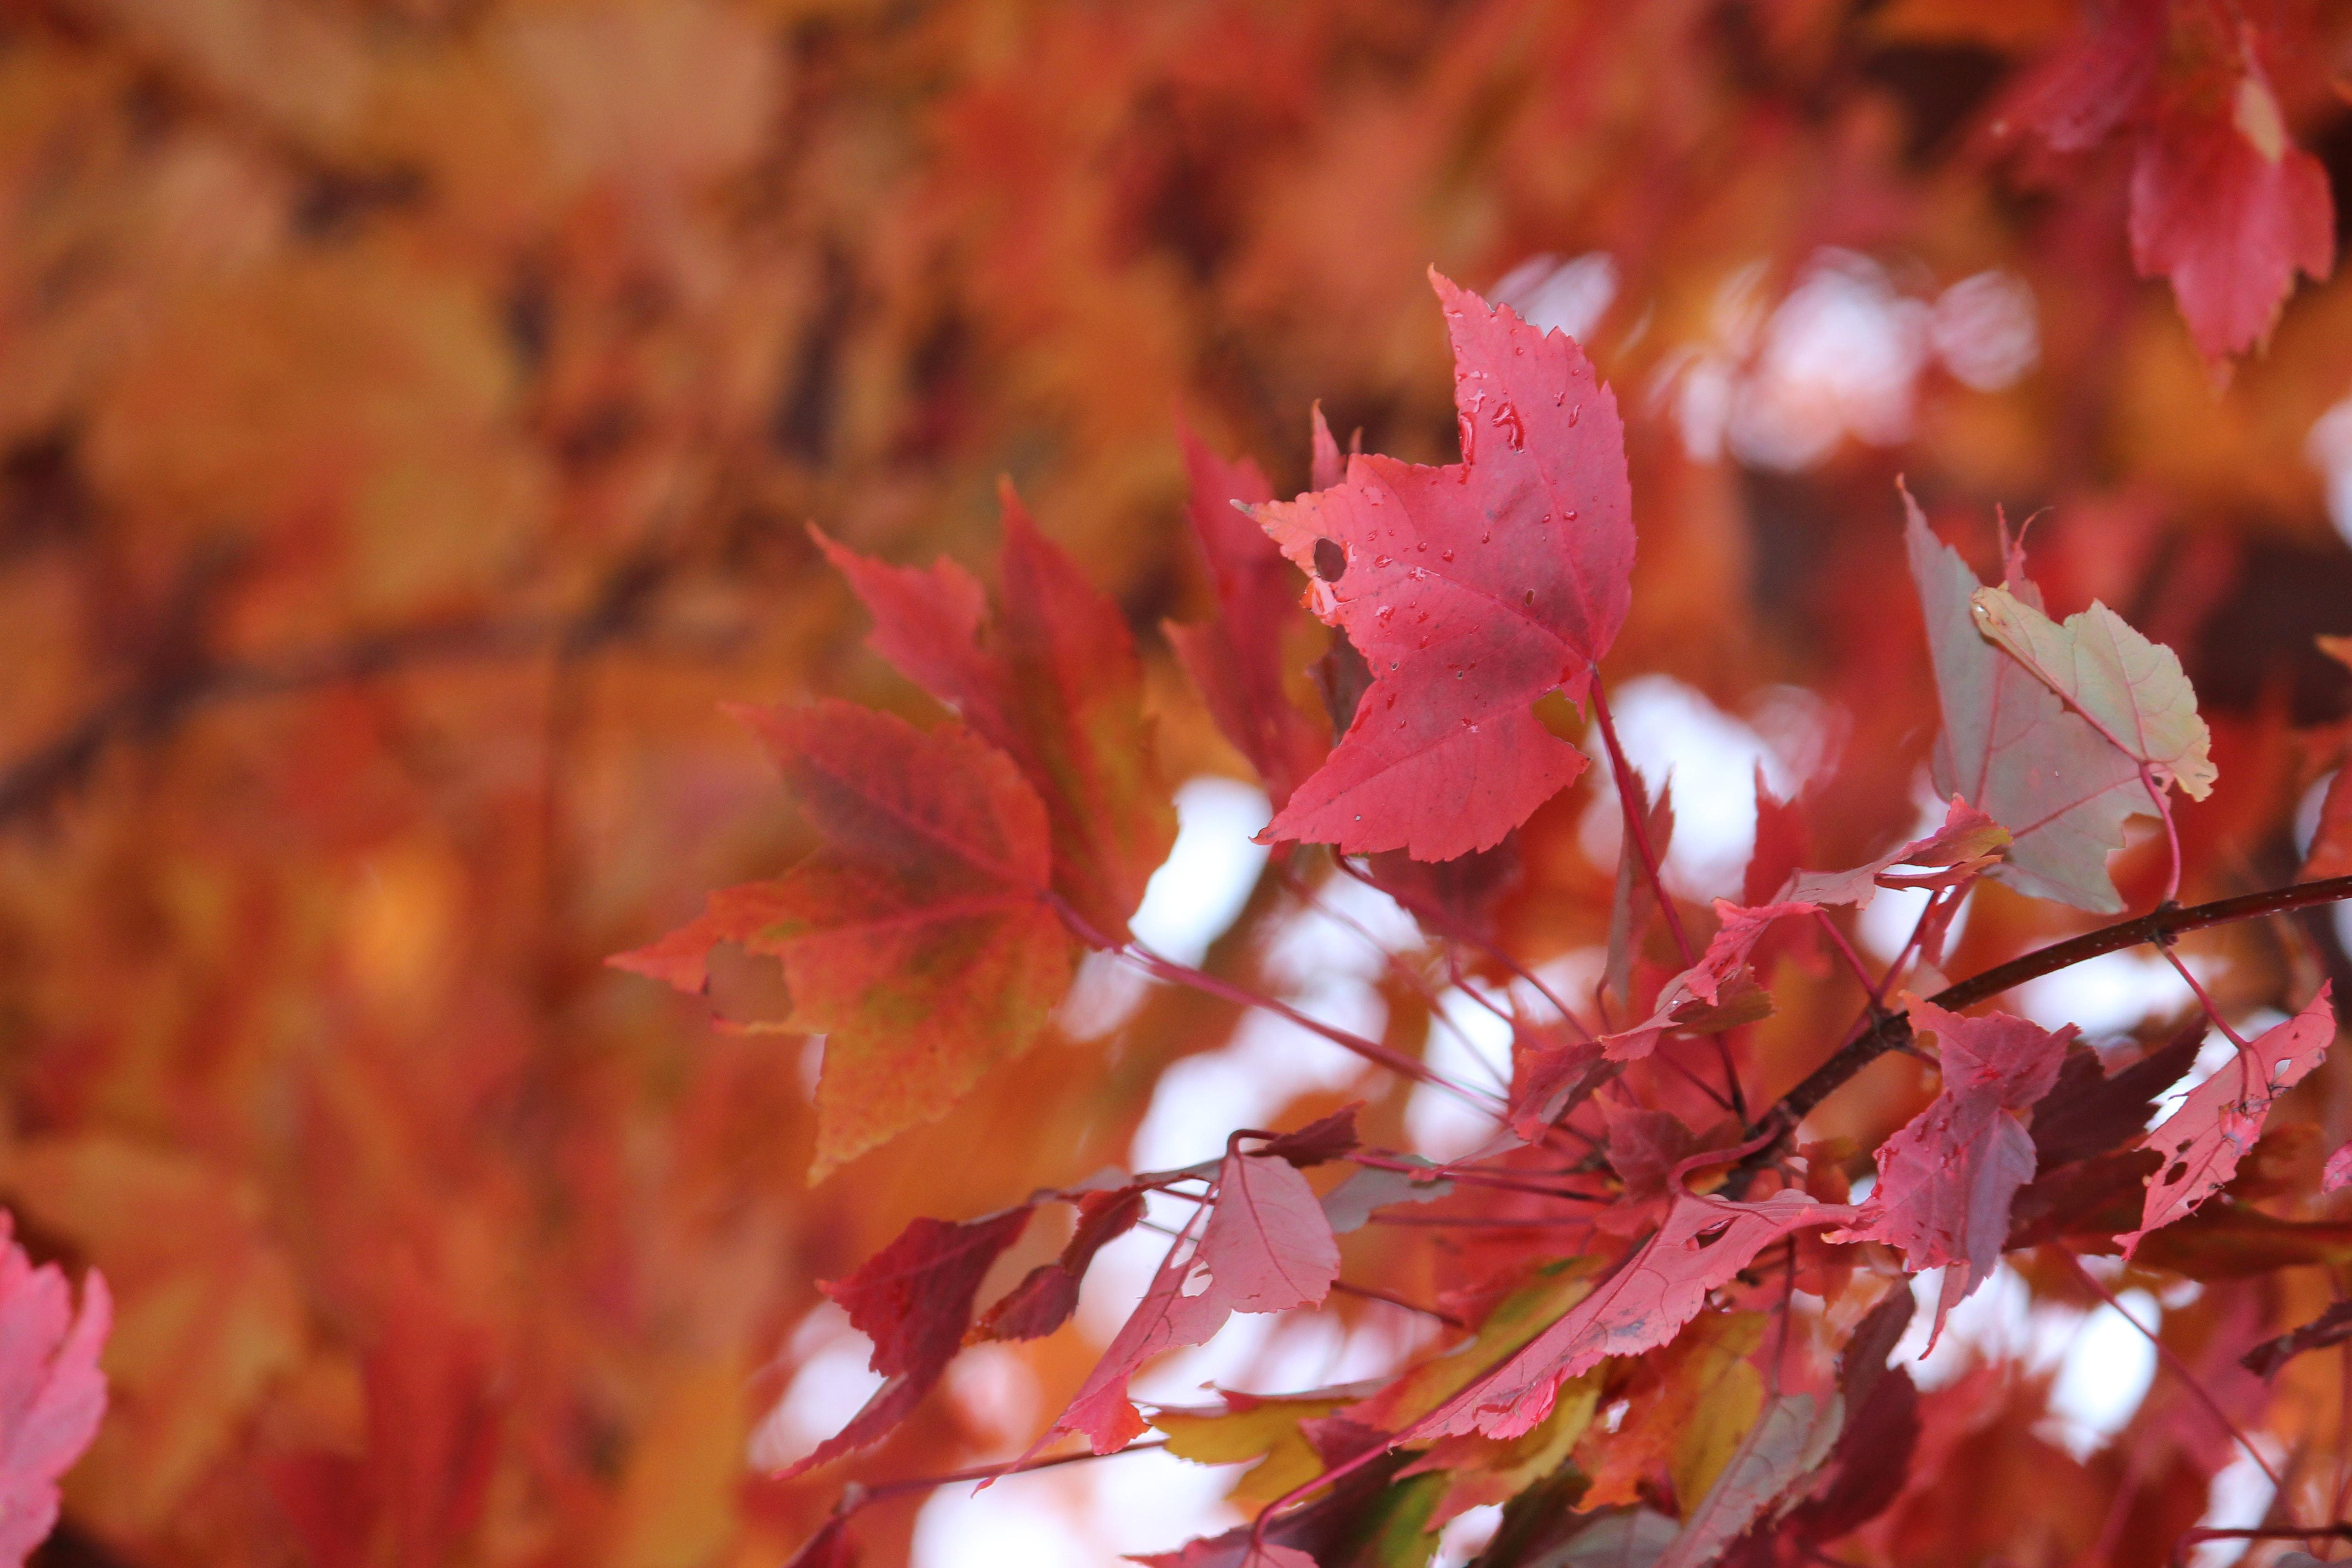 New England fall maple leaves. A UMCom photo by Kay Panovec.